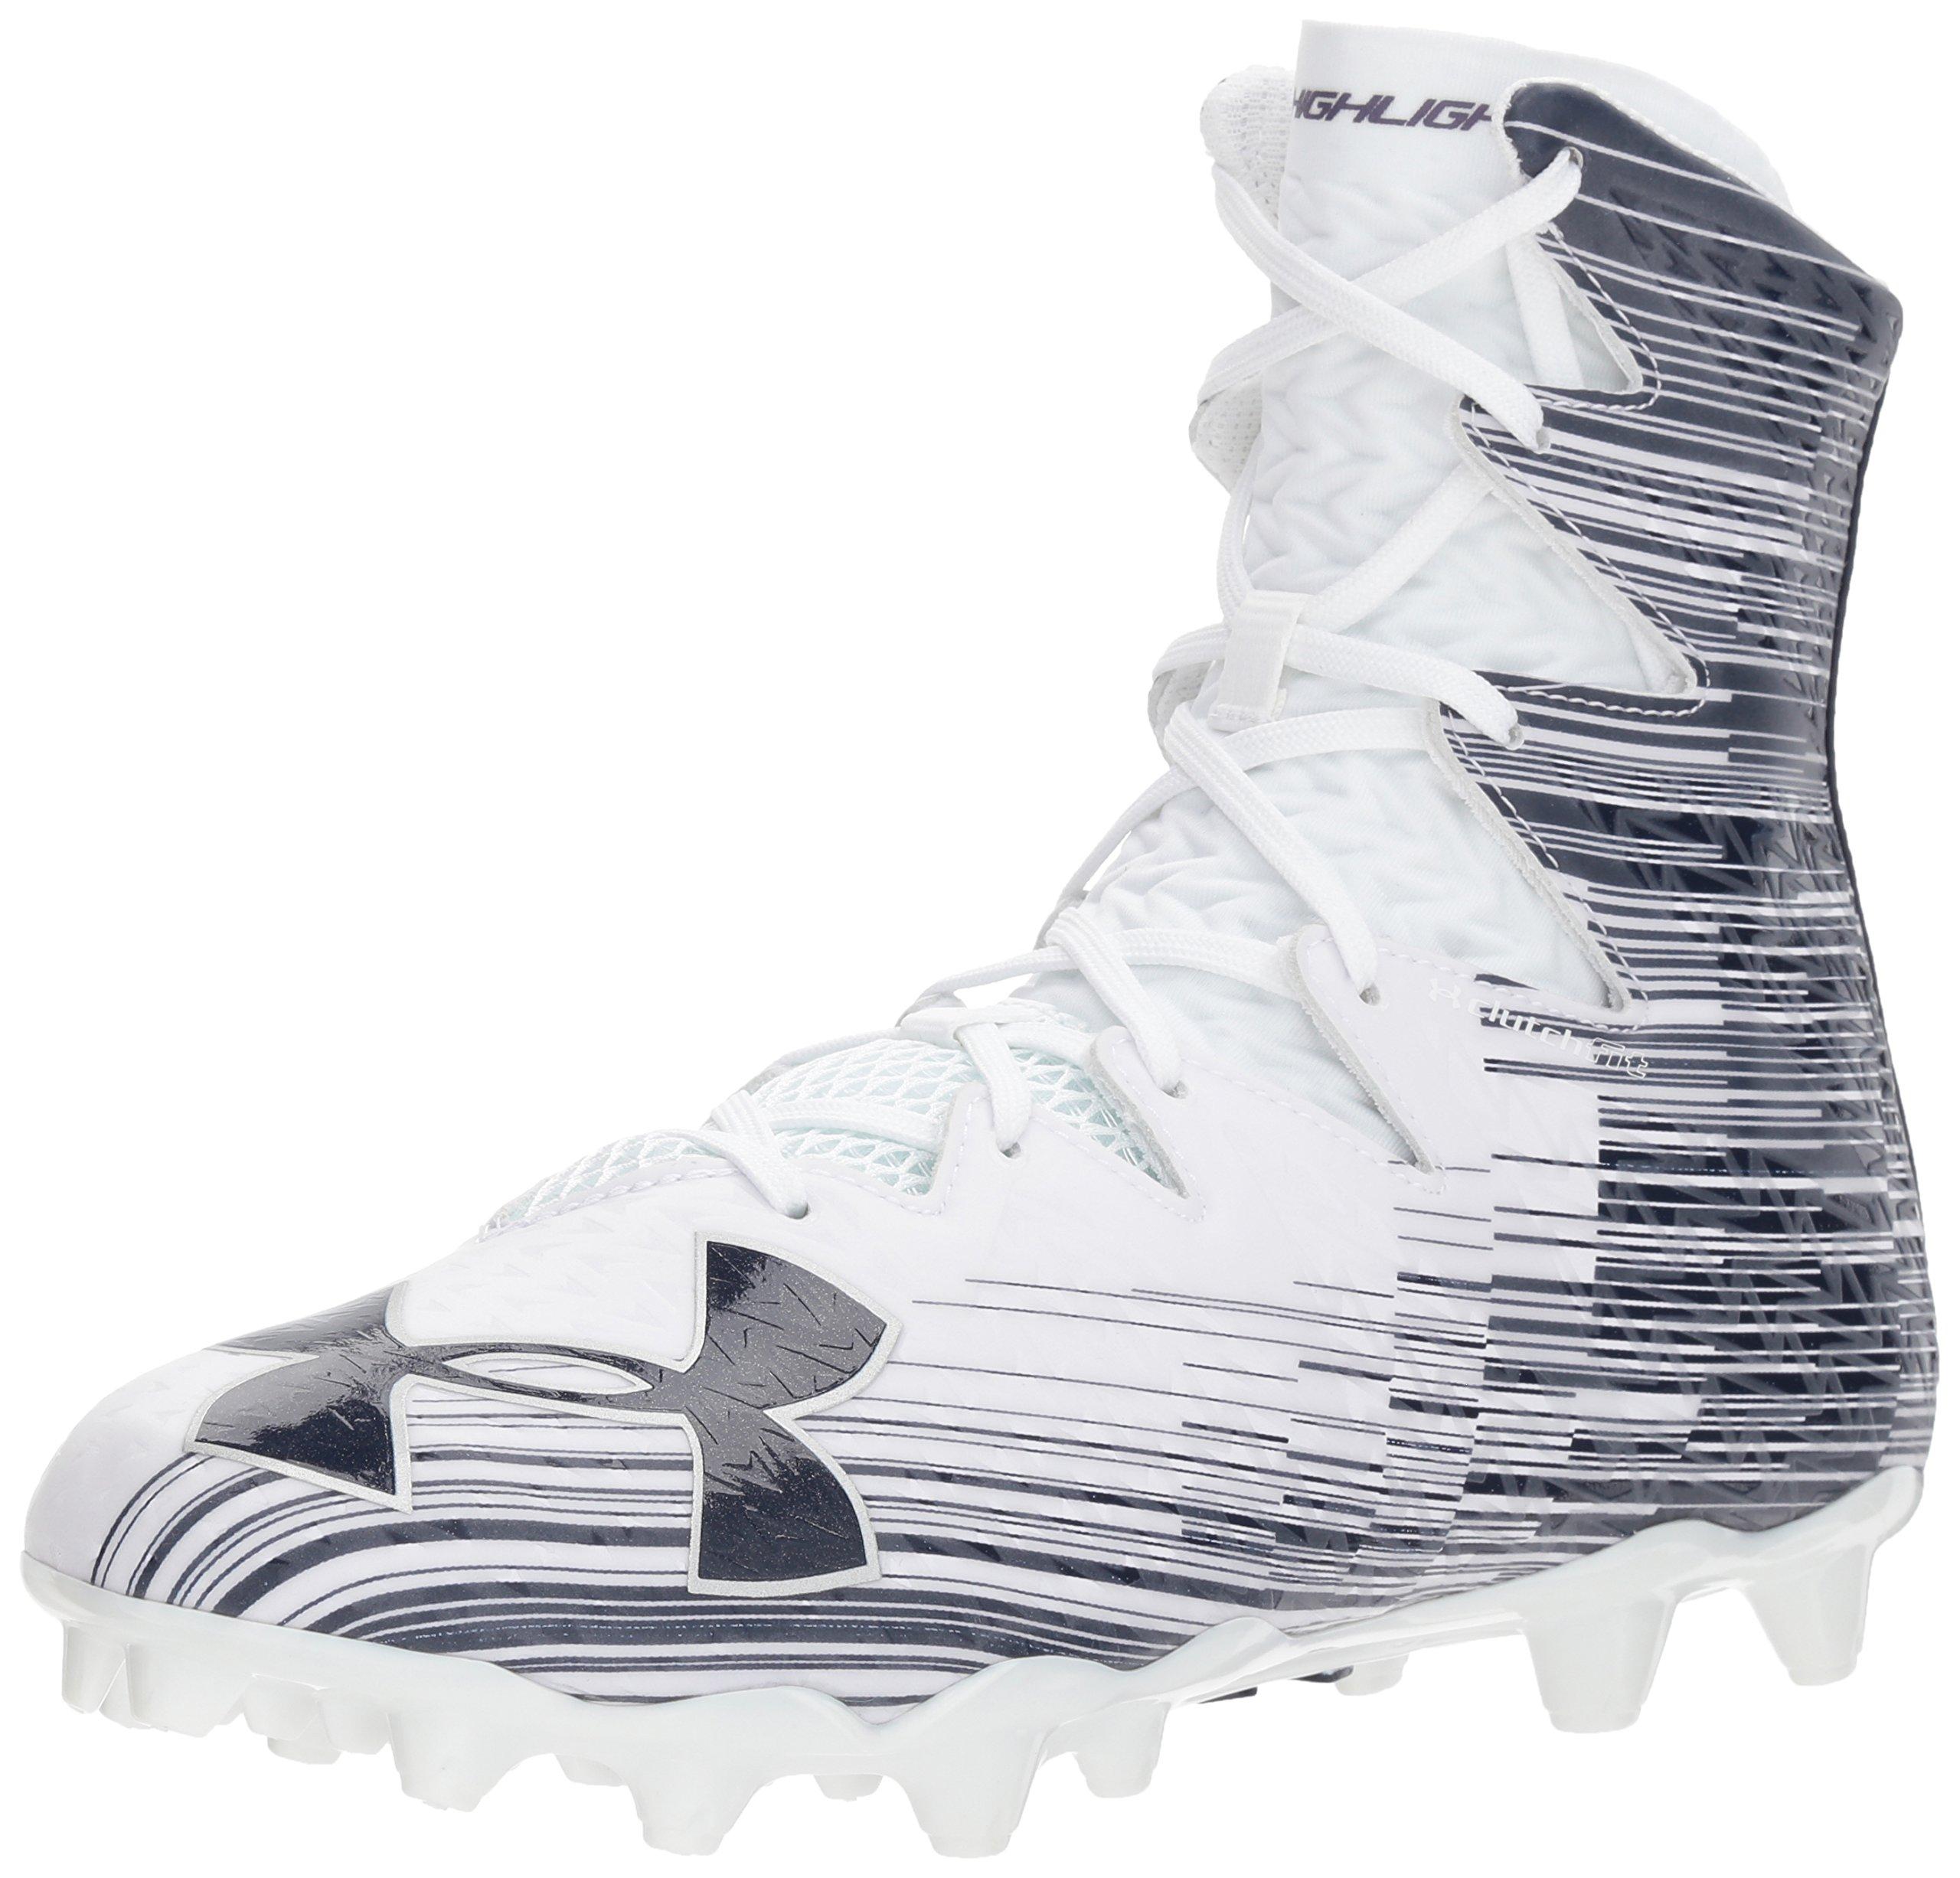 Under Armour Men's Highlight M.C. Lacrosse Shoe, White (142)/Midnight Navy, 7